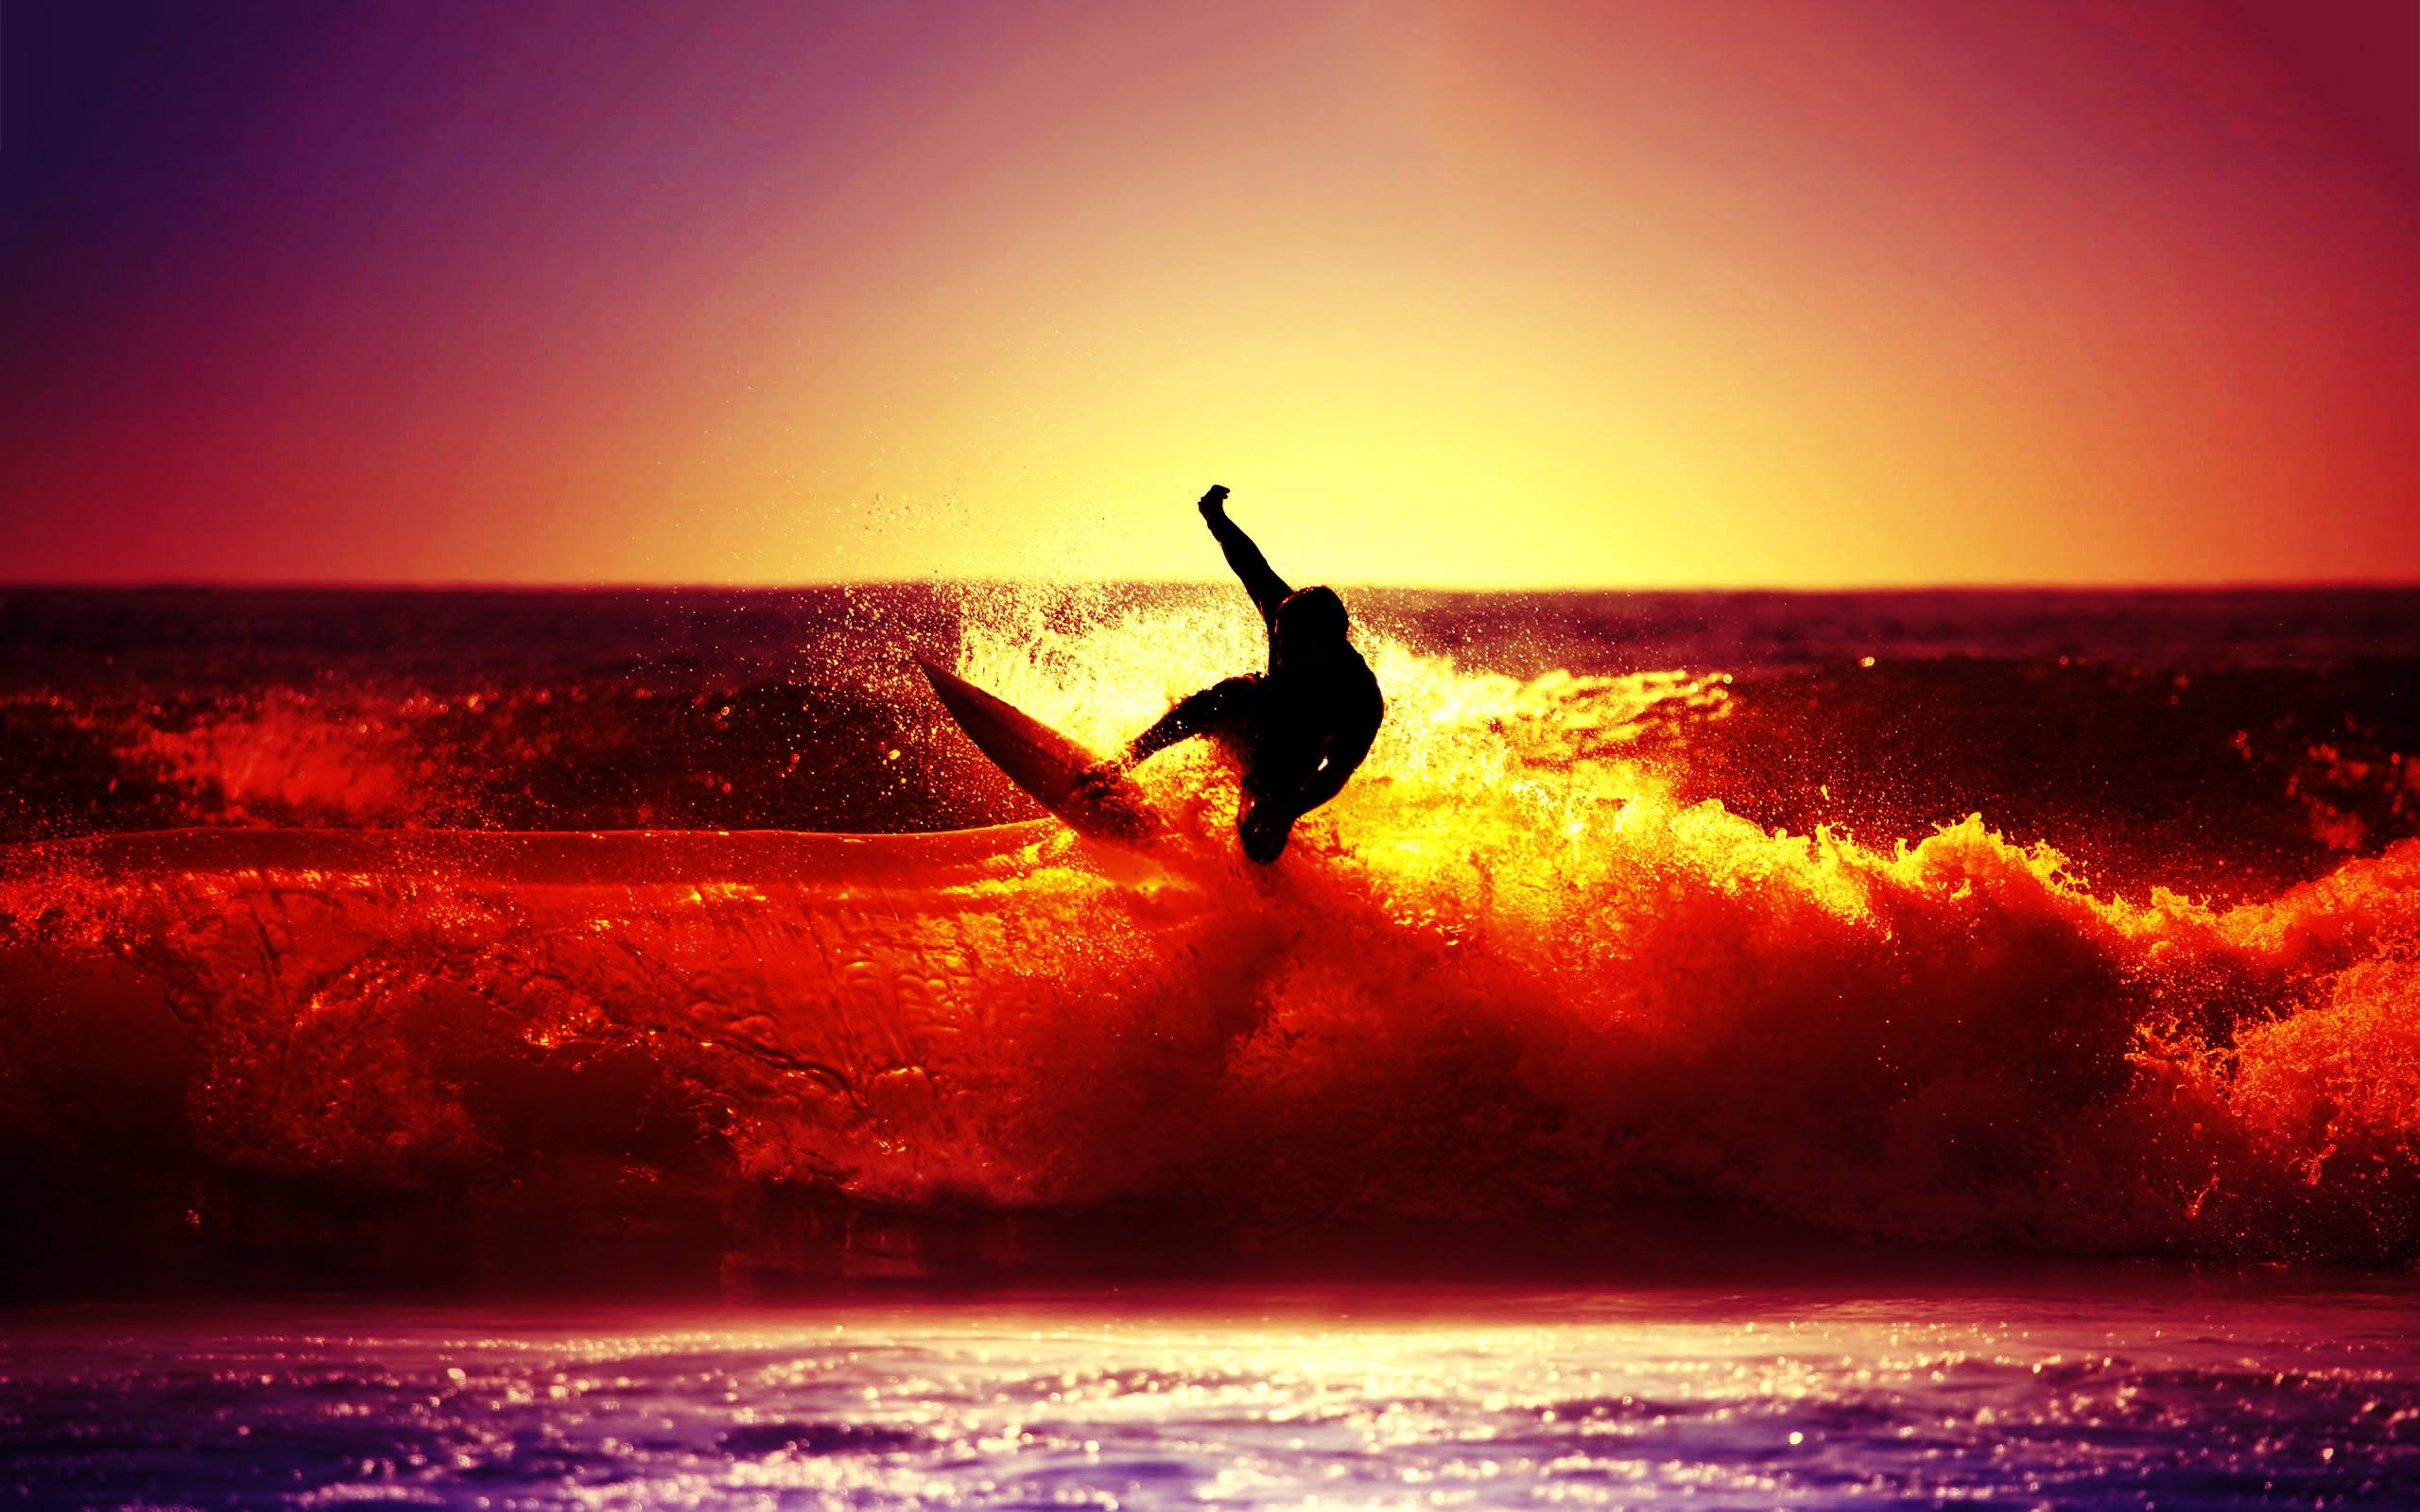 33 Surf Sunset Wallpaper On Wallpapersafari